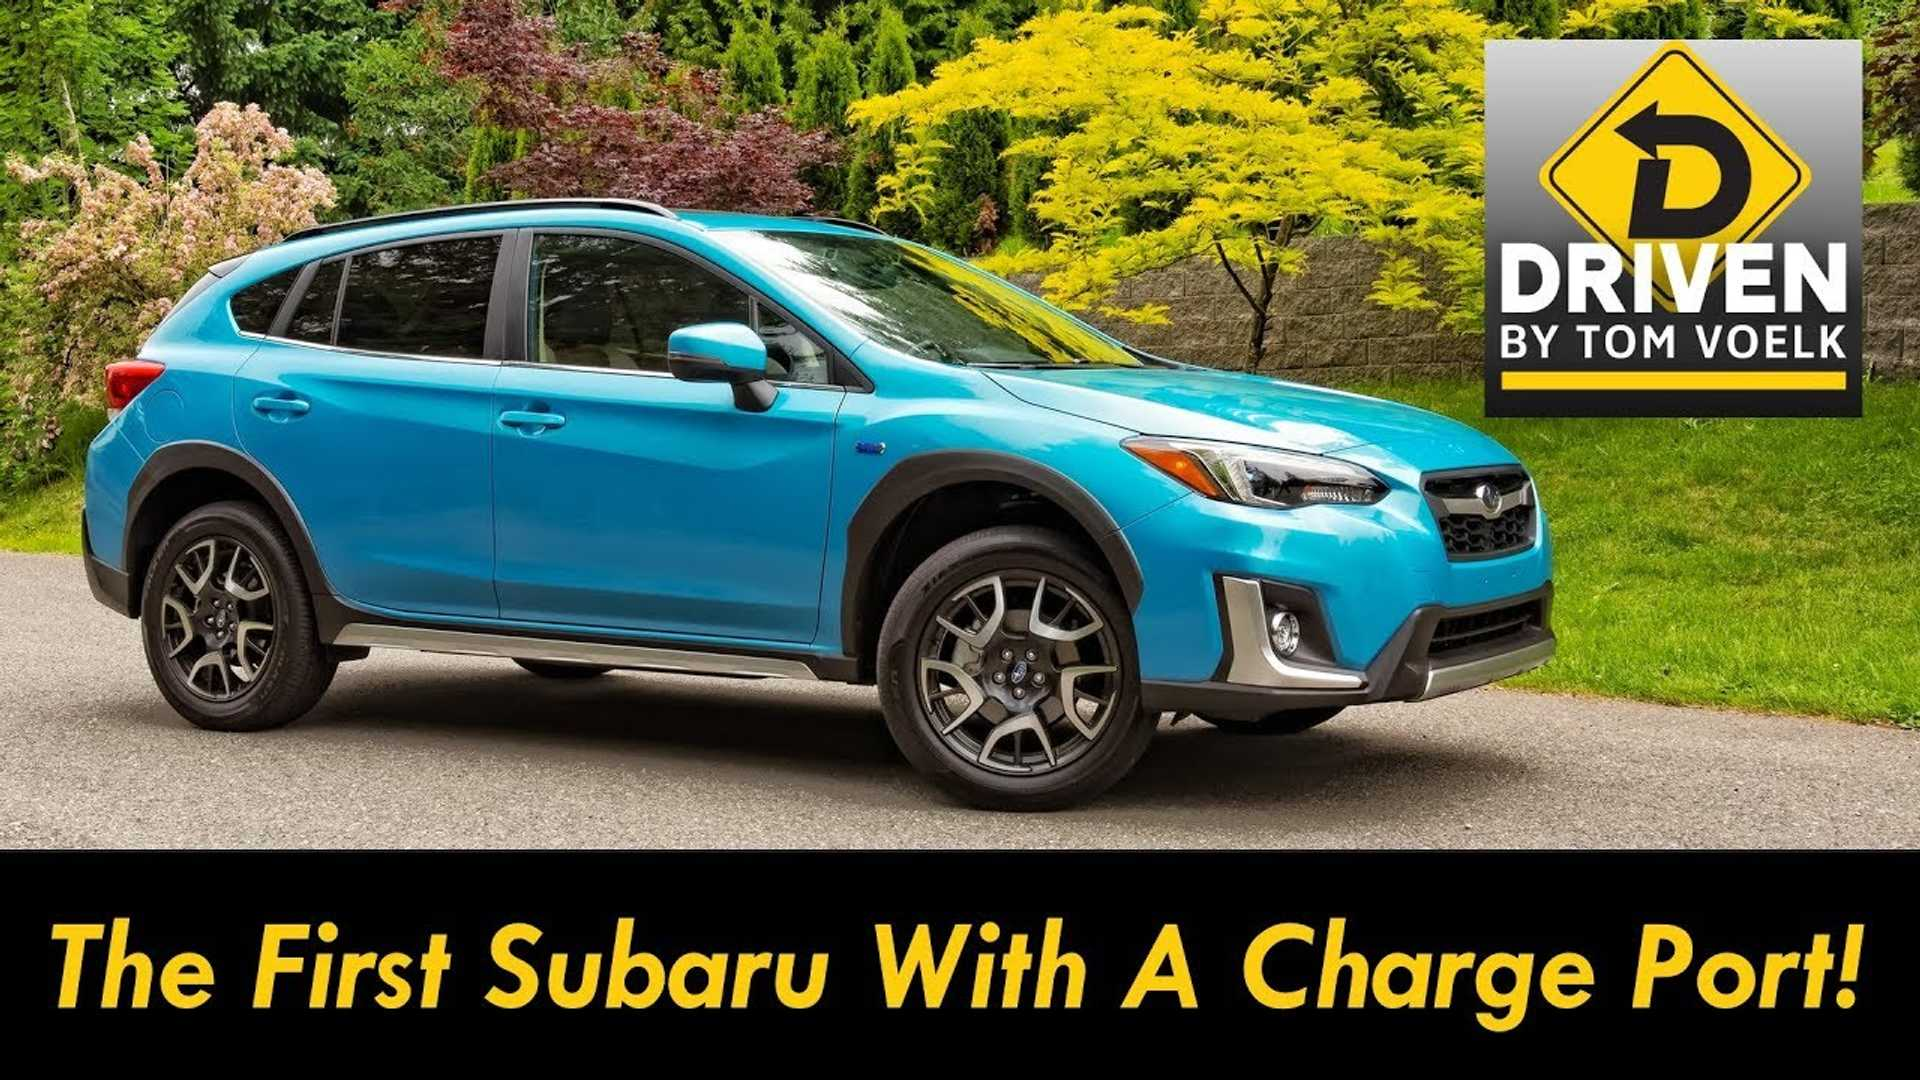 Subaru Crosstrek Hybrid PHEV Tested By Driven Car Reviews: Video